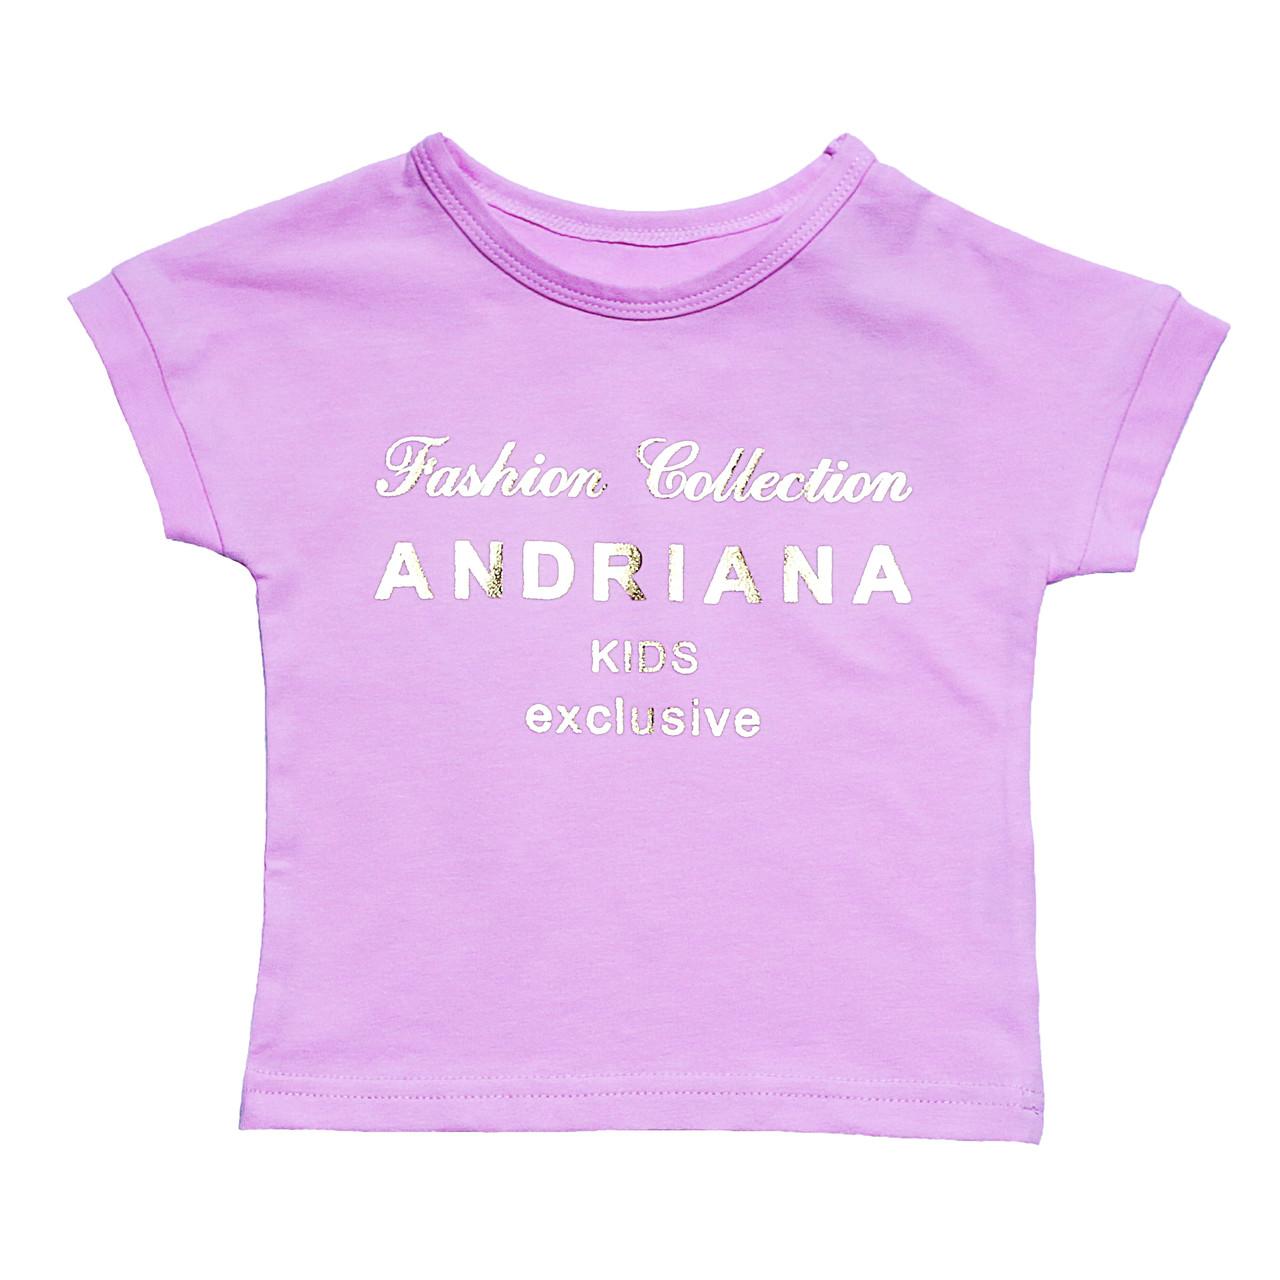 Футболка 18М, 24М, 36М Andriana Kids для девочки, розовая